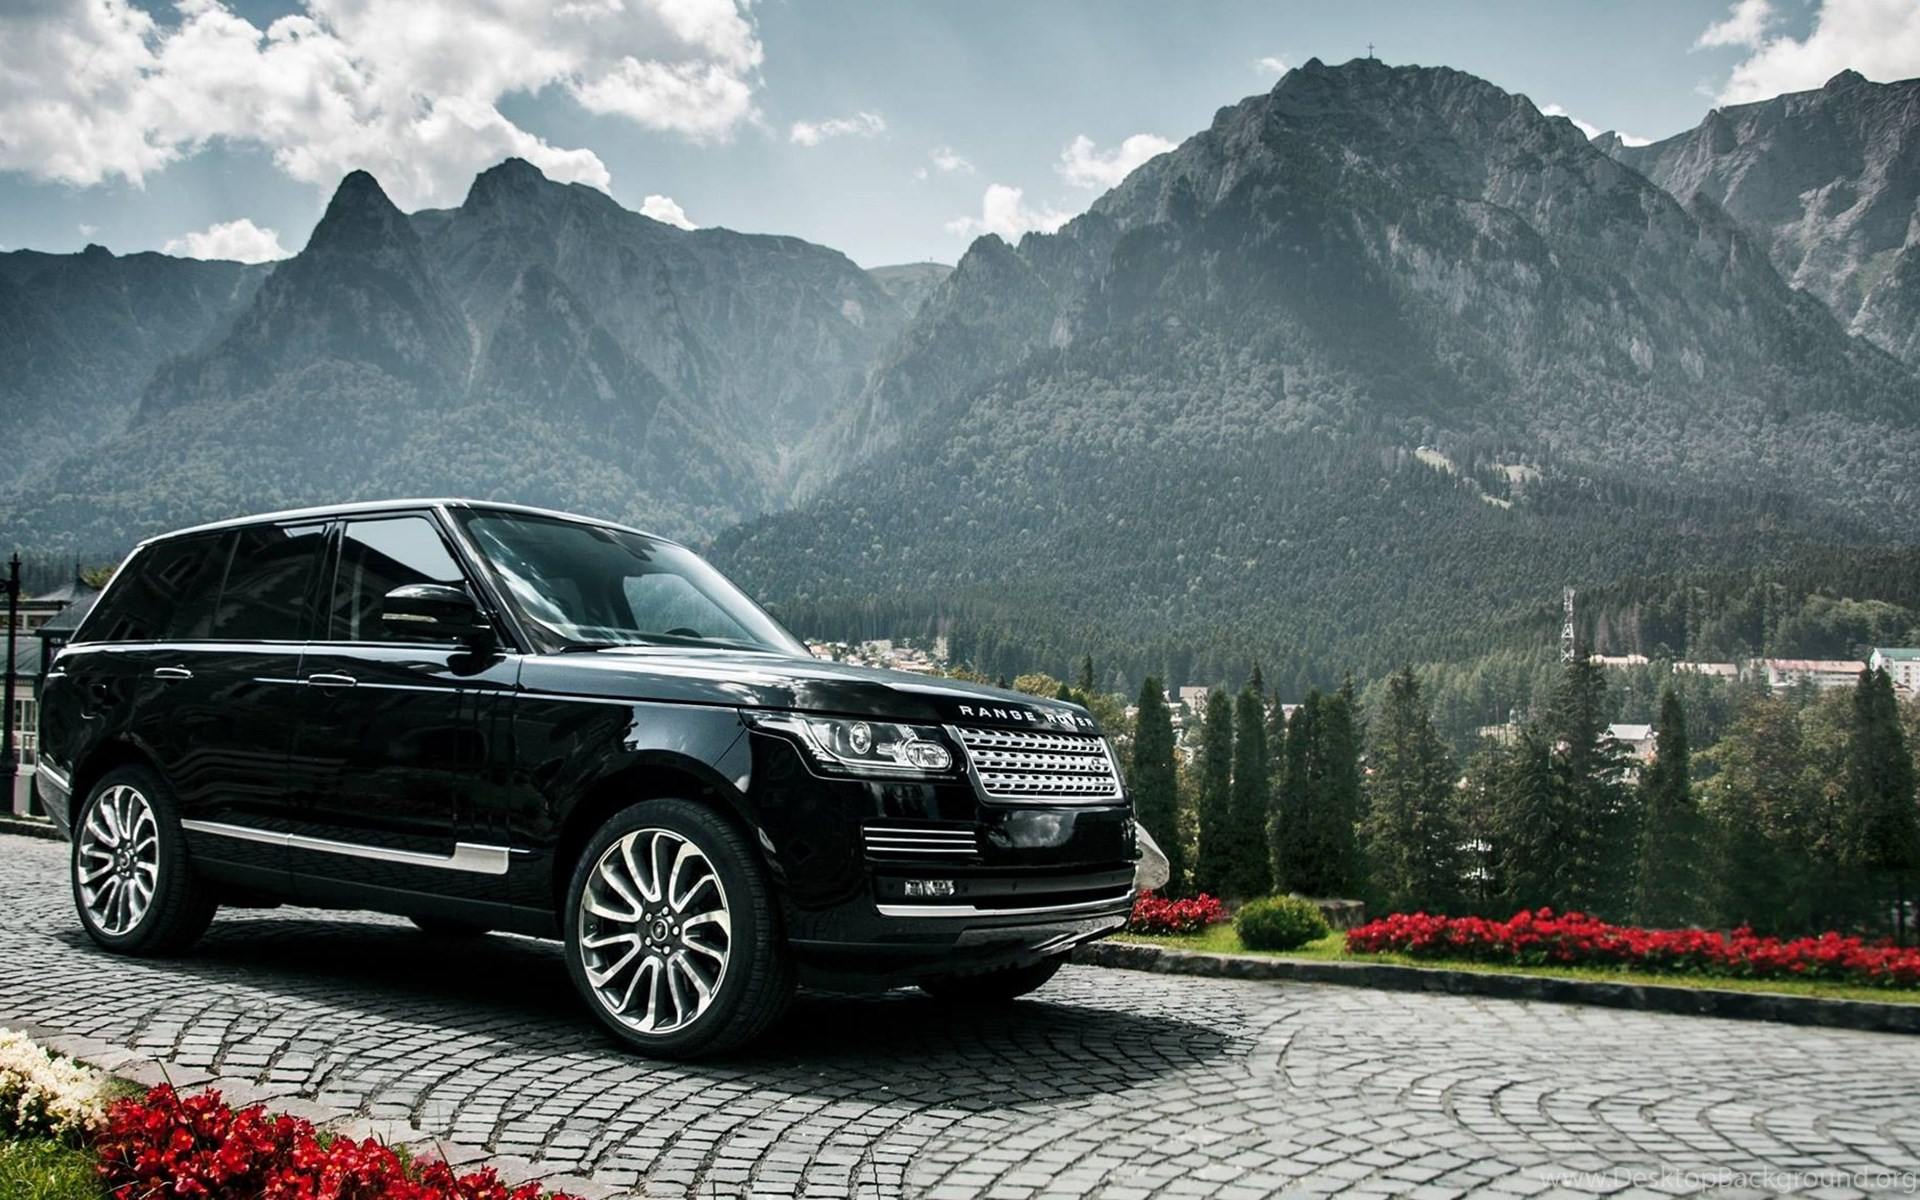 4k Ultra Hd Range Rover Wallpapers Hd Desktop Backgrounds 3840x2160